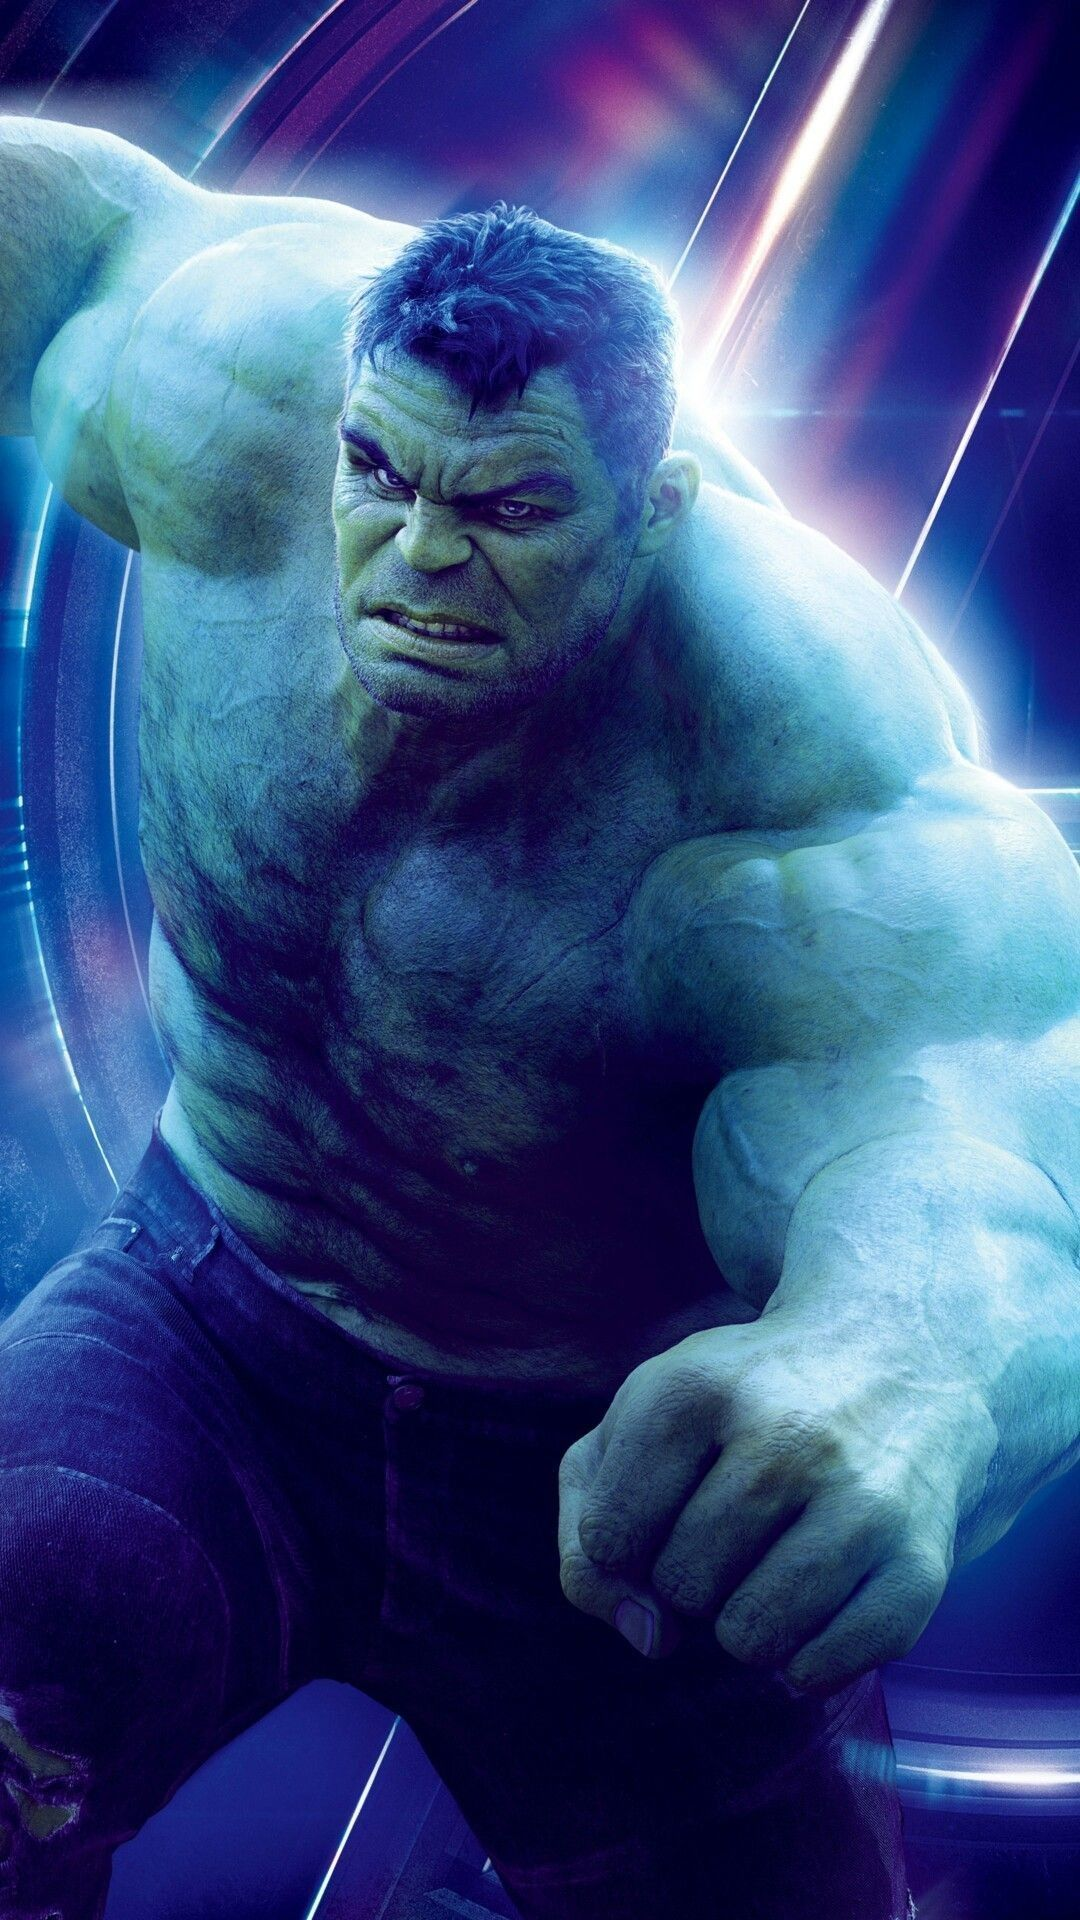 avengers infinity war jrs hulk bruce banner   jrs   pinterest   hulk